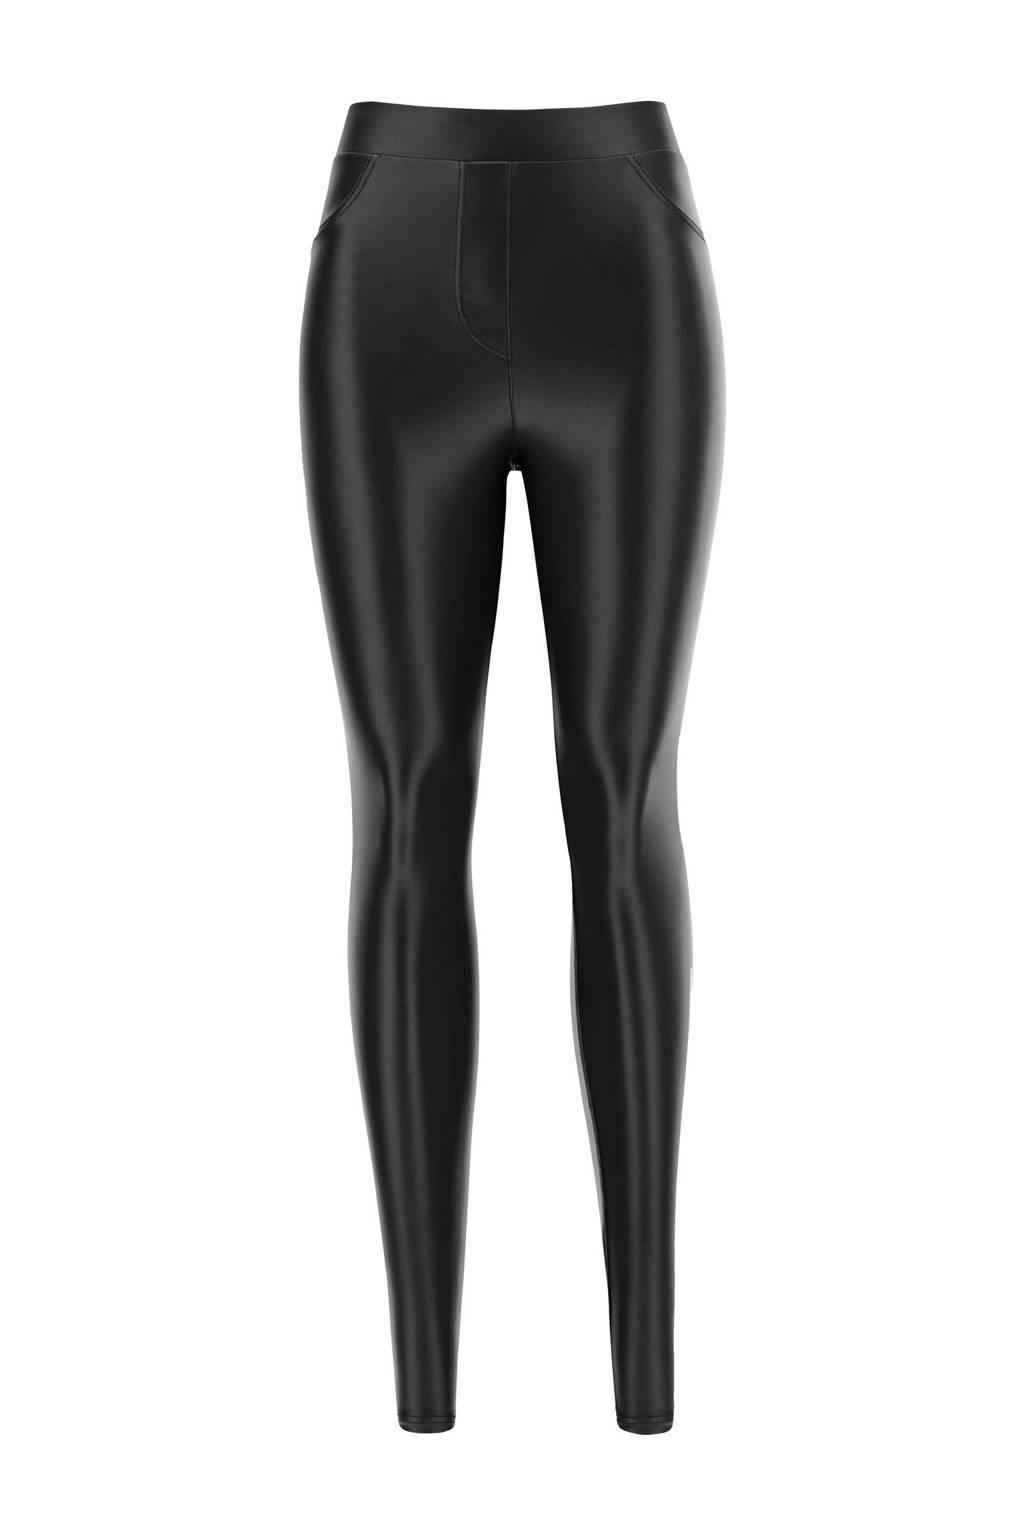 Oroblu gecoate jegging Pearl zwart, Zwart